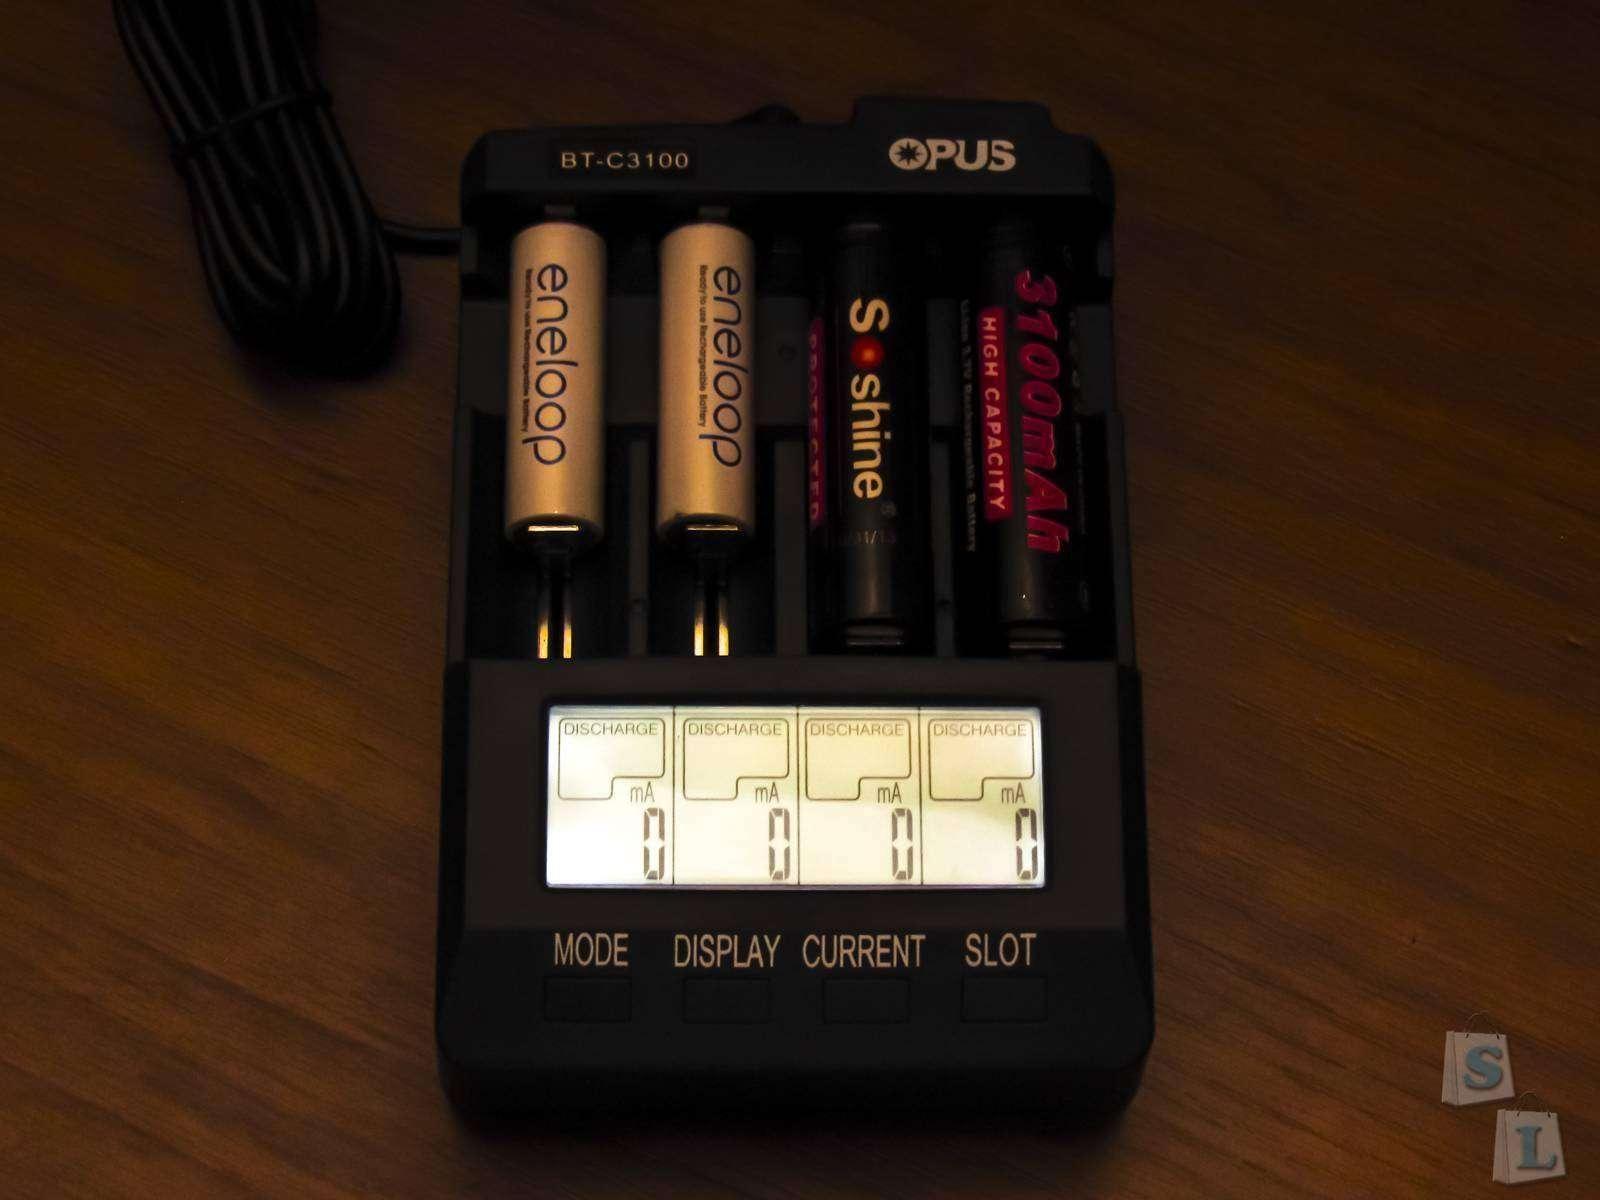 GearBest: Всеядная зарядка для NiCd/NiMH/Li-ion аккумуляторов - Opus BT - C3100 V2.1